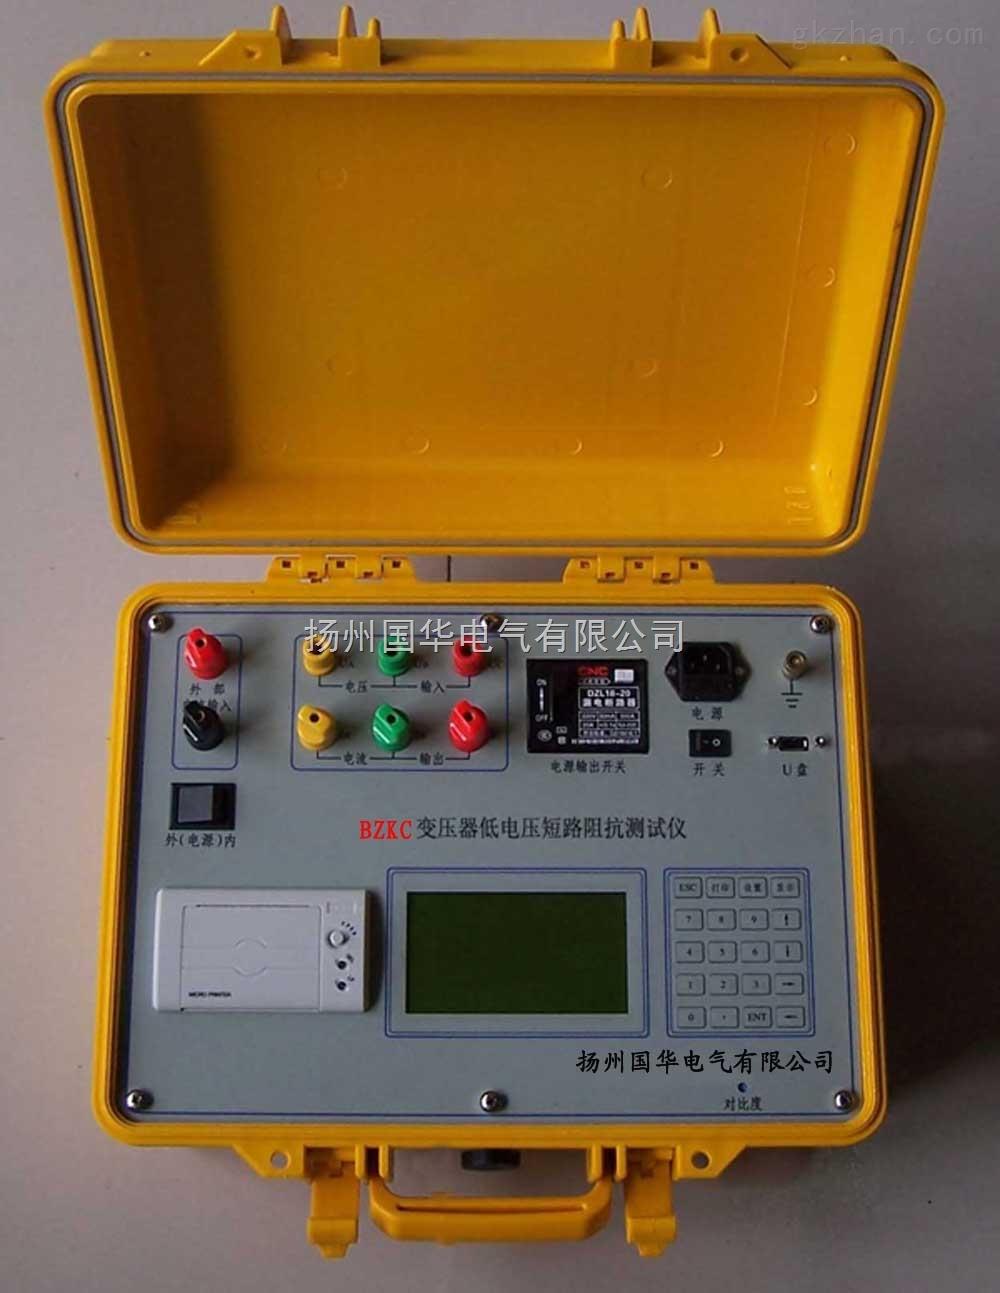 bzkc型变压器低电压短路阻抗测试仪